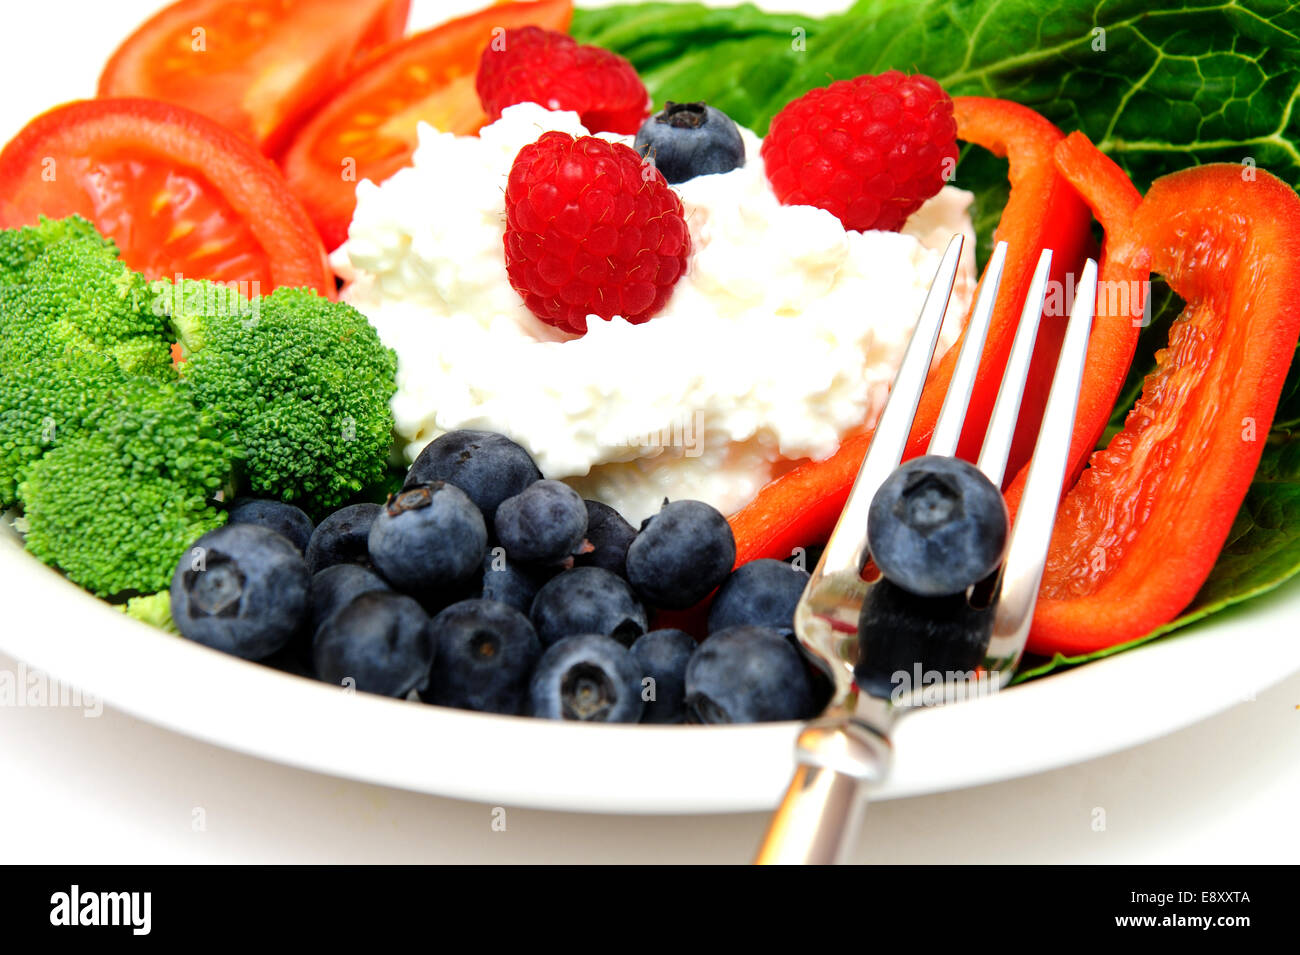 Fruit Salad - Stock Image